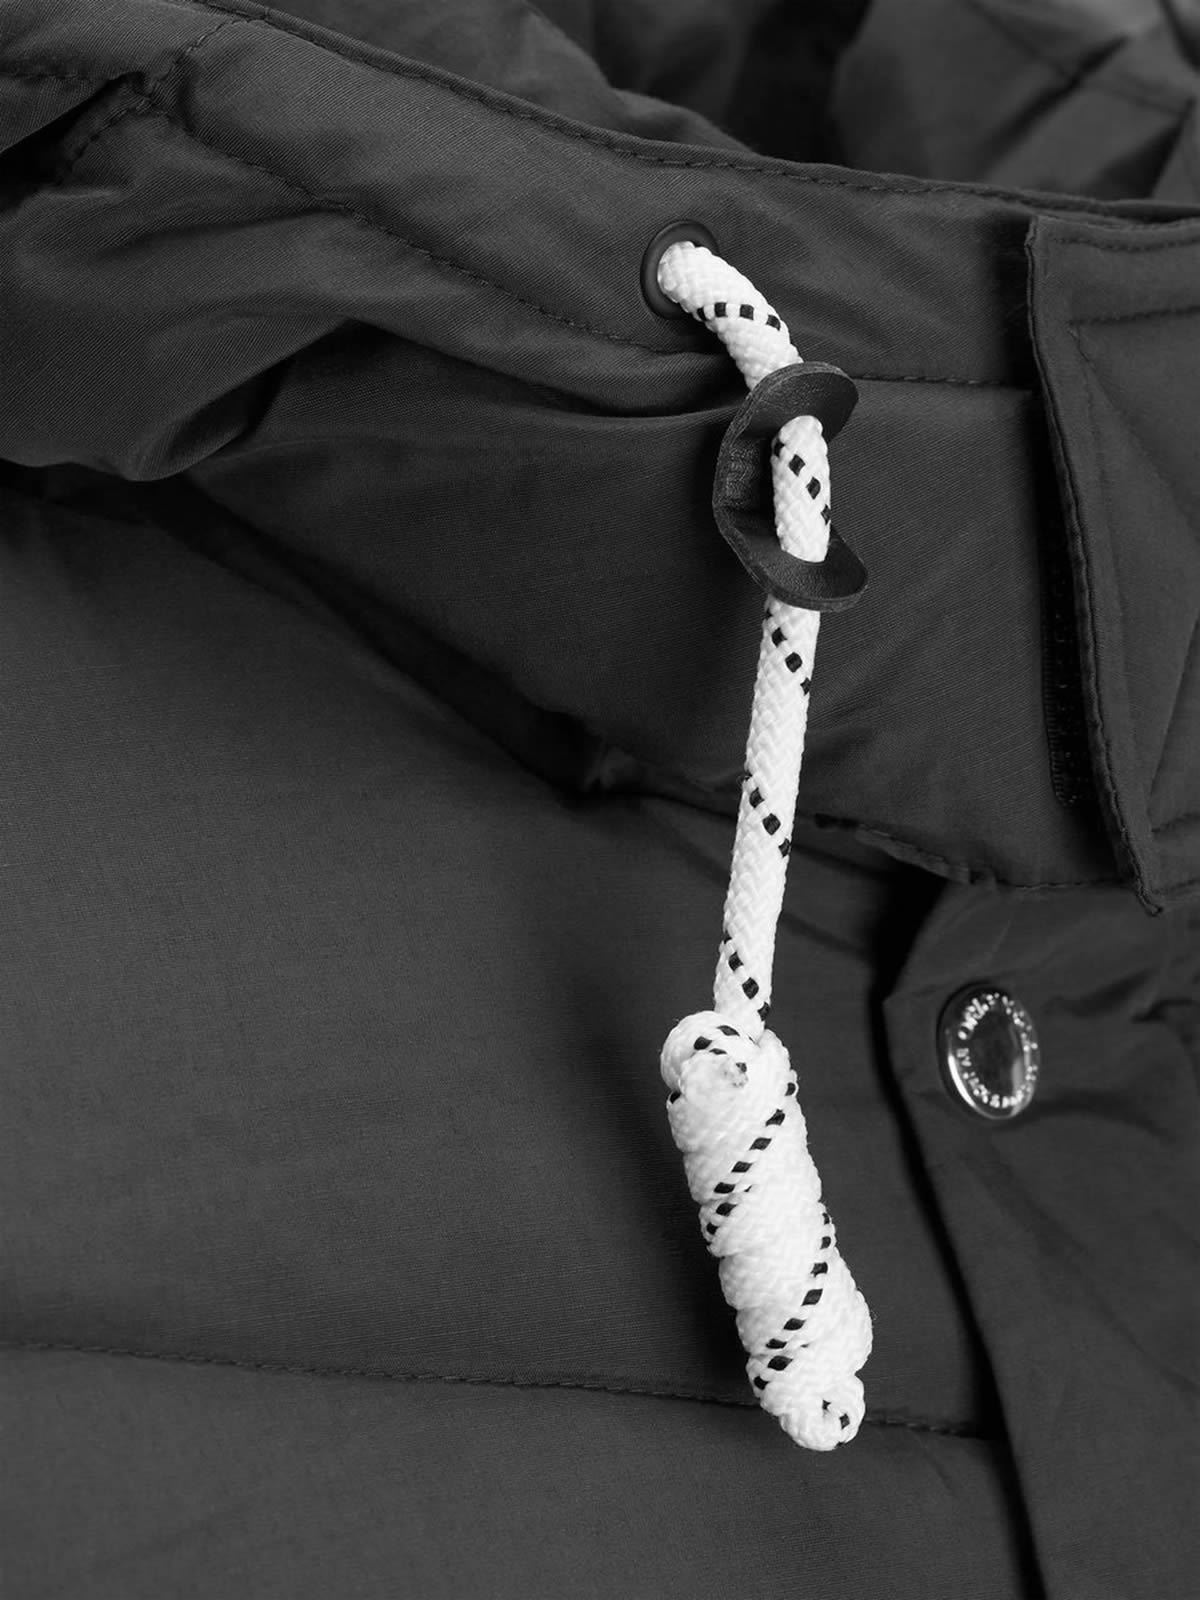 JACK-amp-JONES-Figure-Mens-Jacket-Hooded-Zip-Up-Padded-Bomber-Coat thumbnail 4